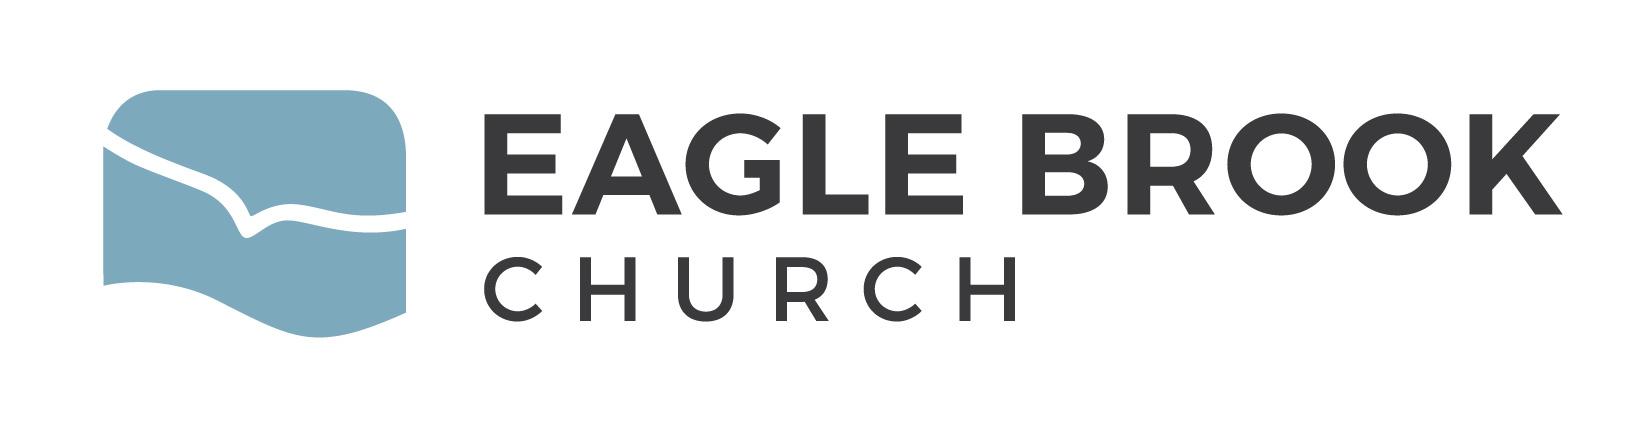 Eagle Brook Church - Anoka Campus